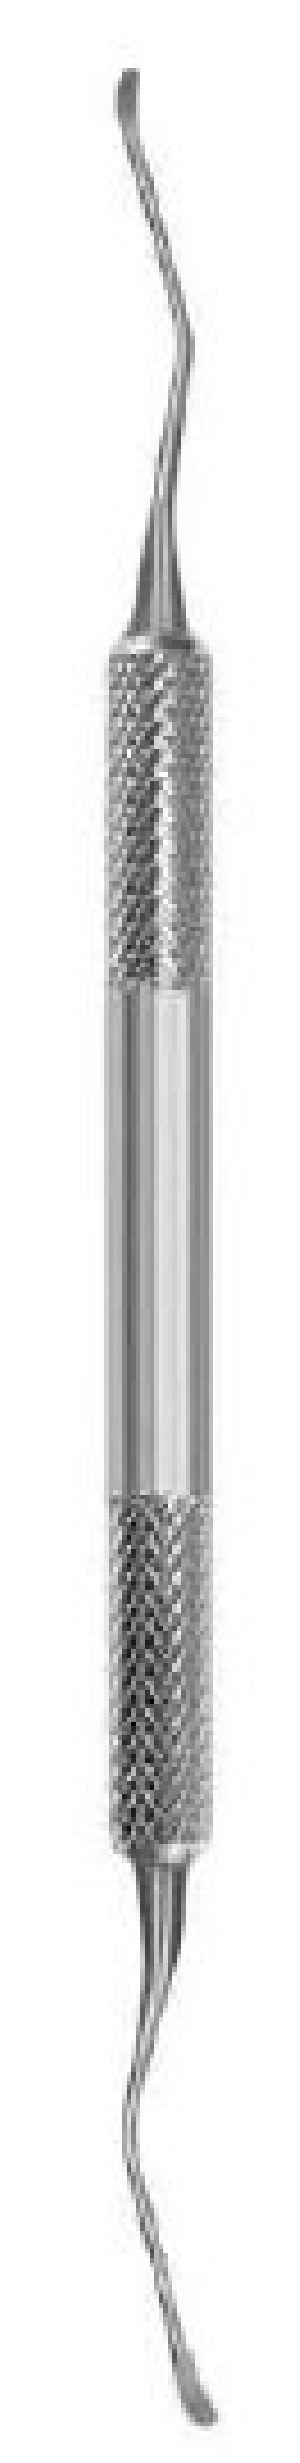 966 Sinus Lift Instrument